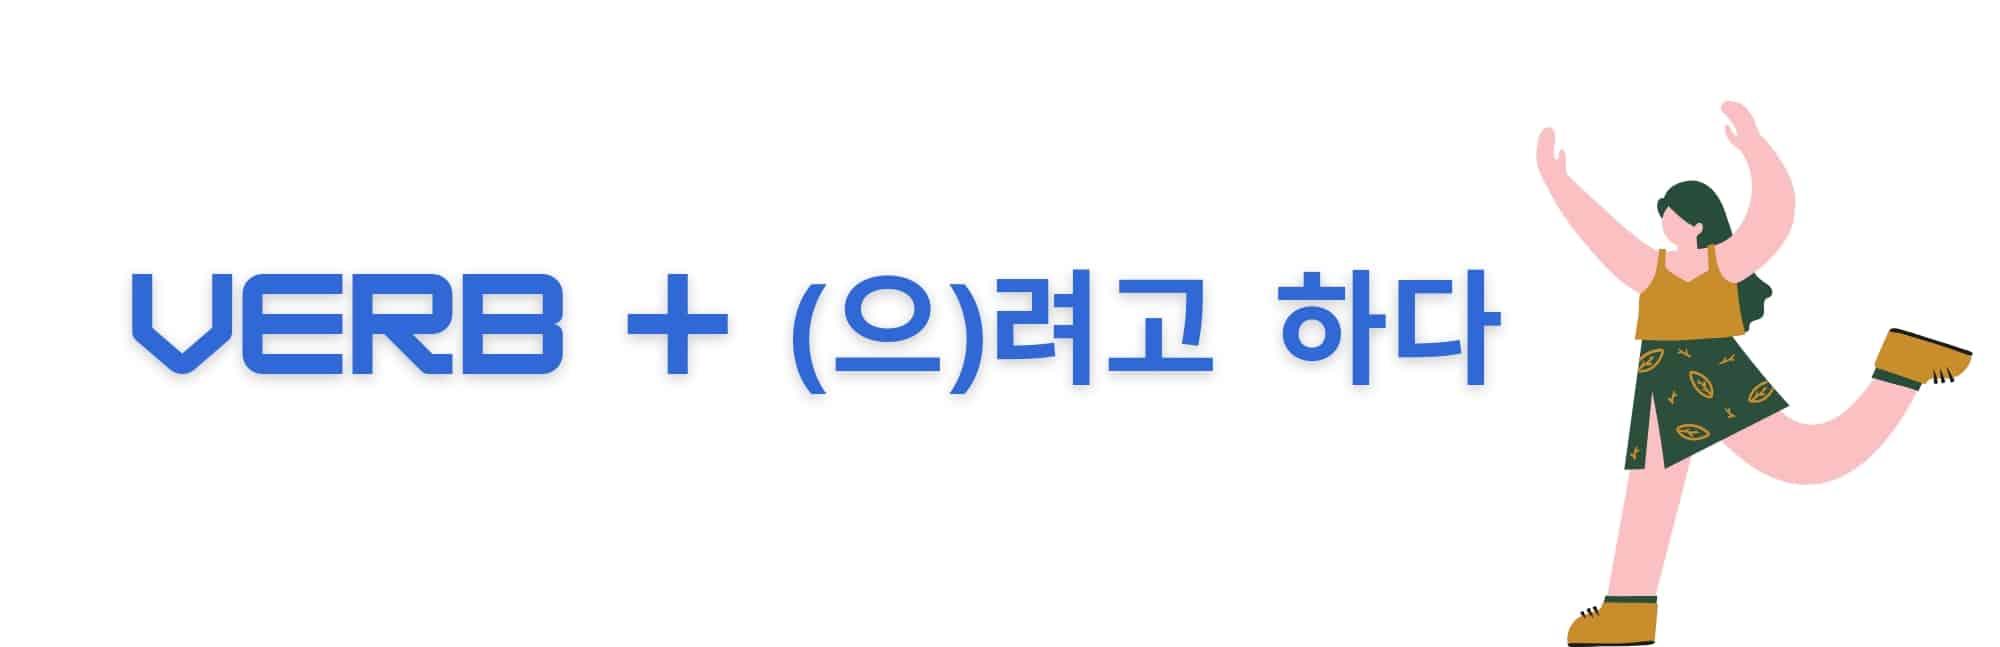 Verb + (으)려고 하다